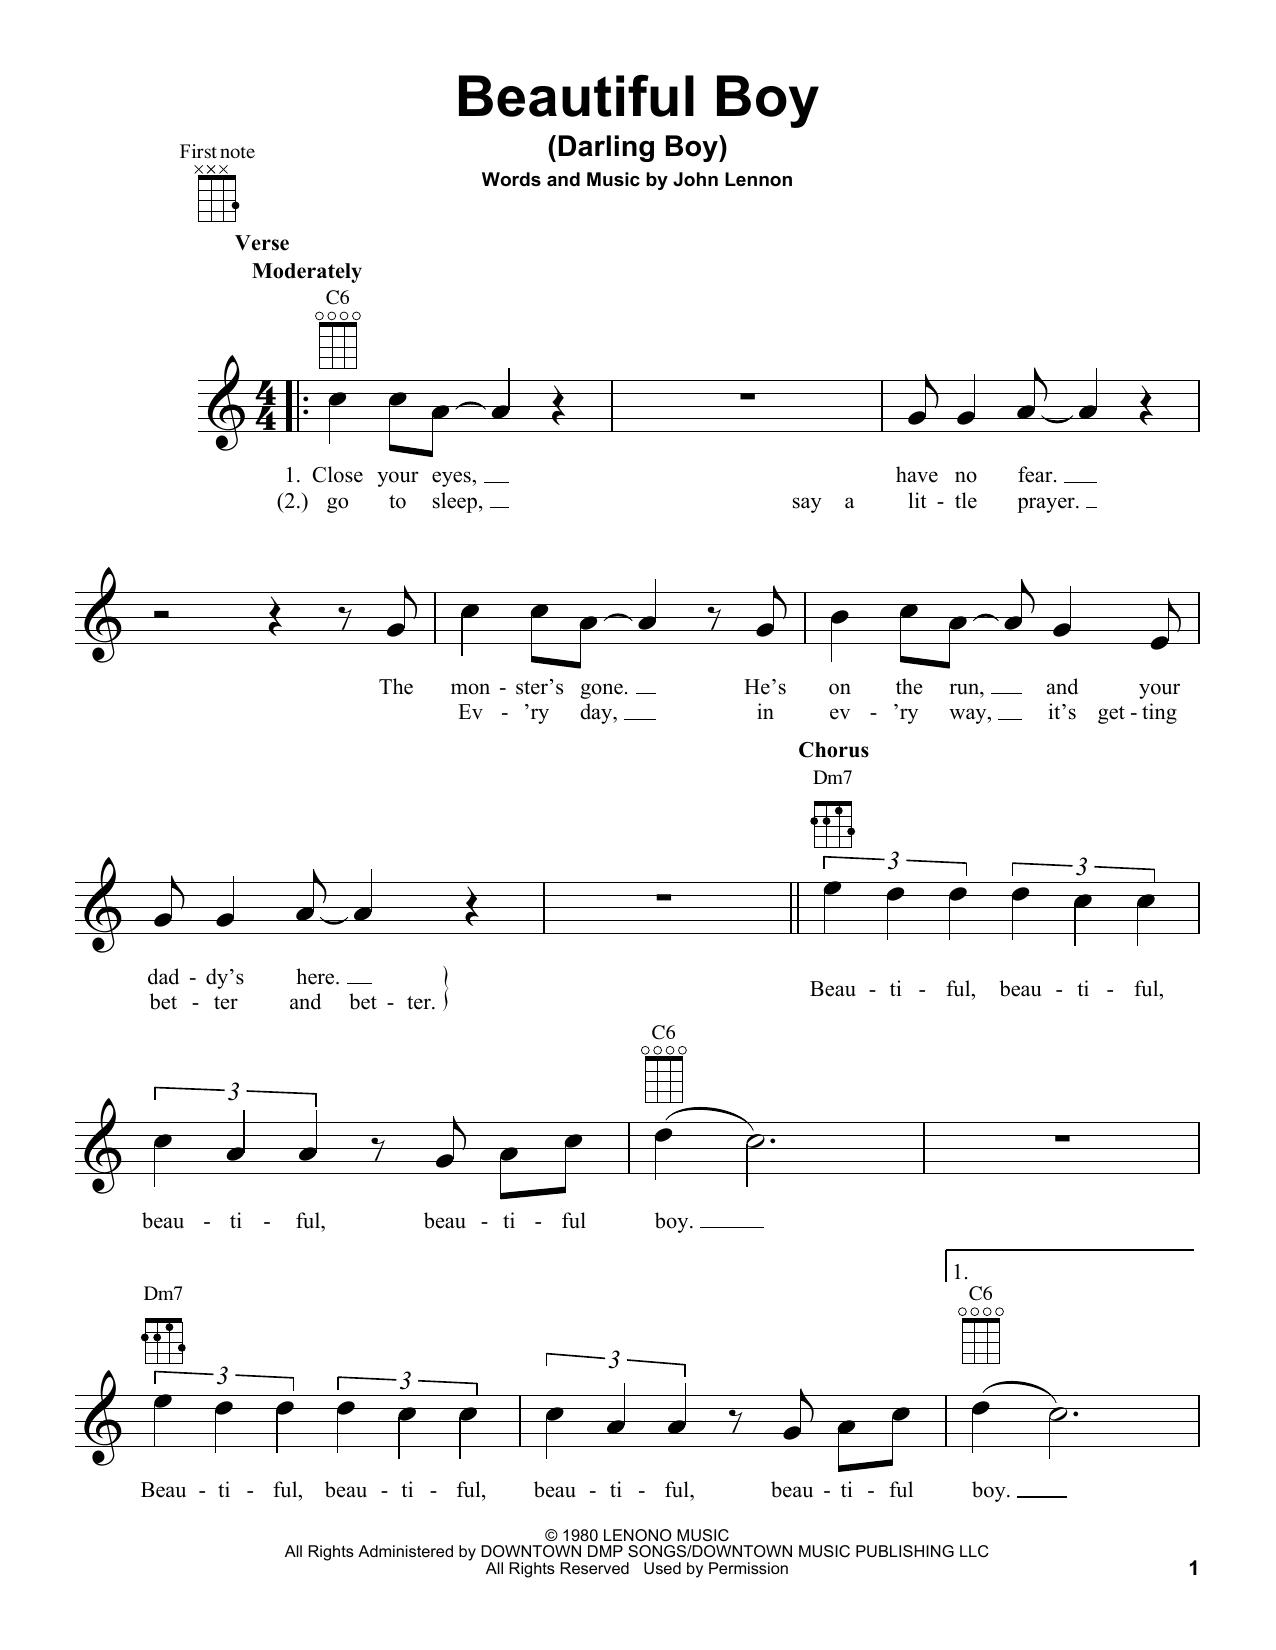 Tablature guitare Beautiful Boy (Darling Boy) de John Lennon - Ukulele